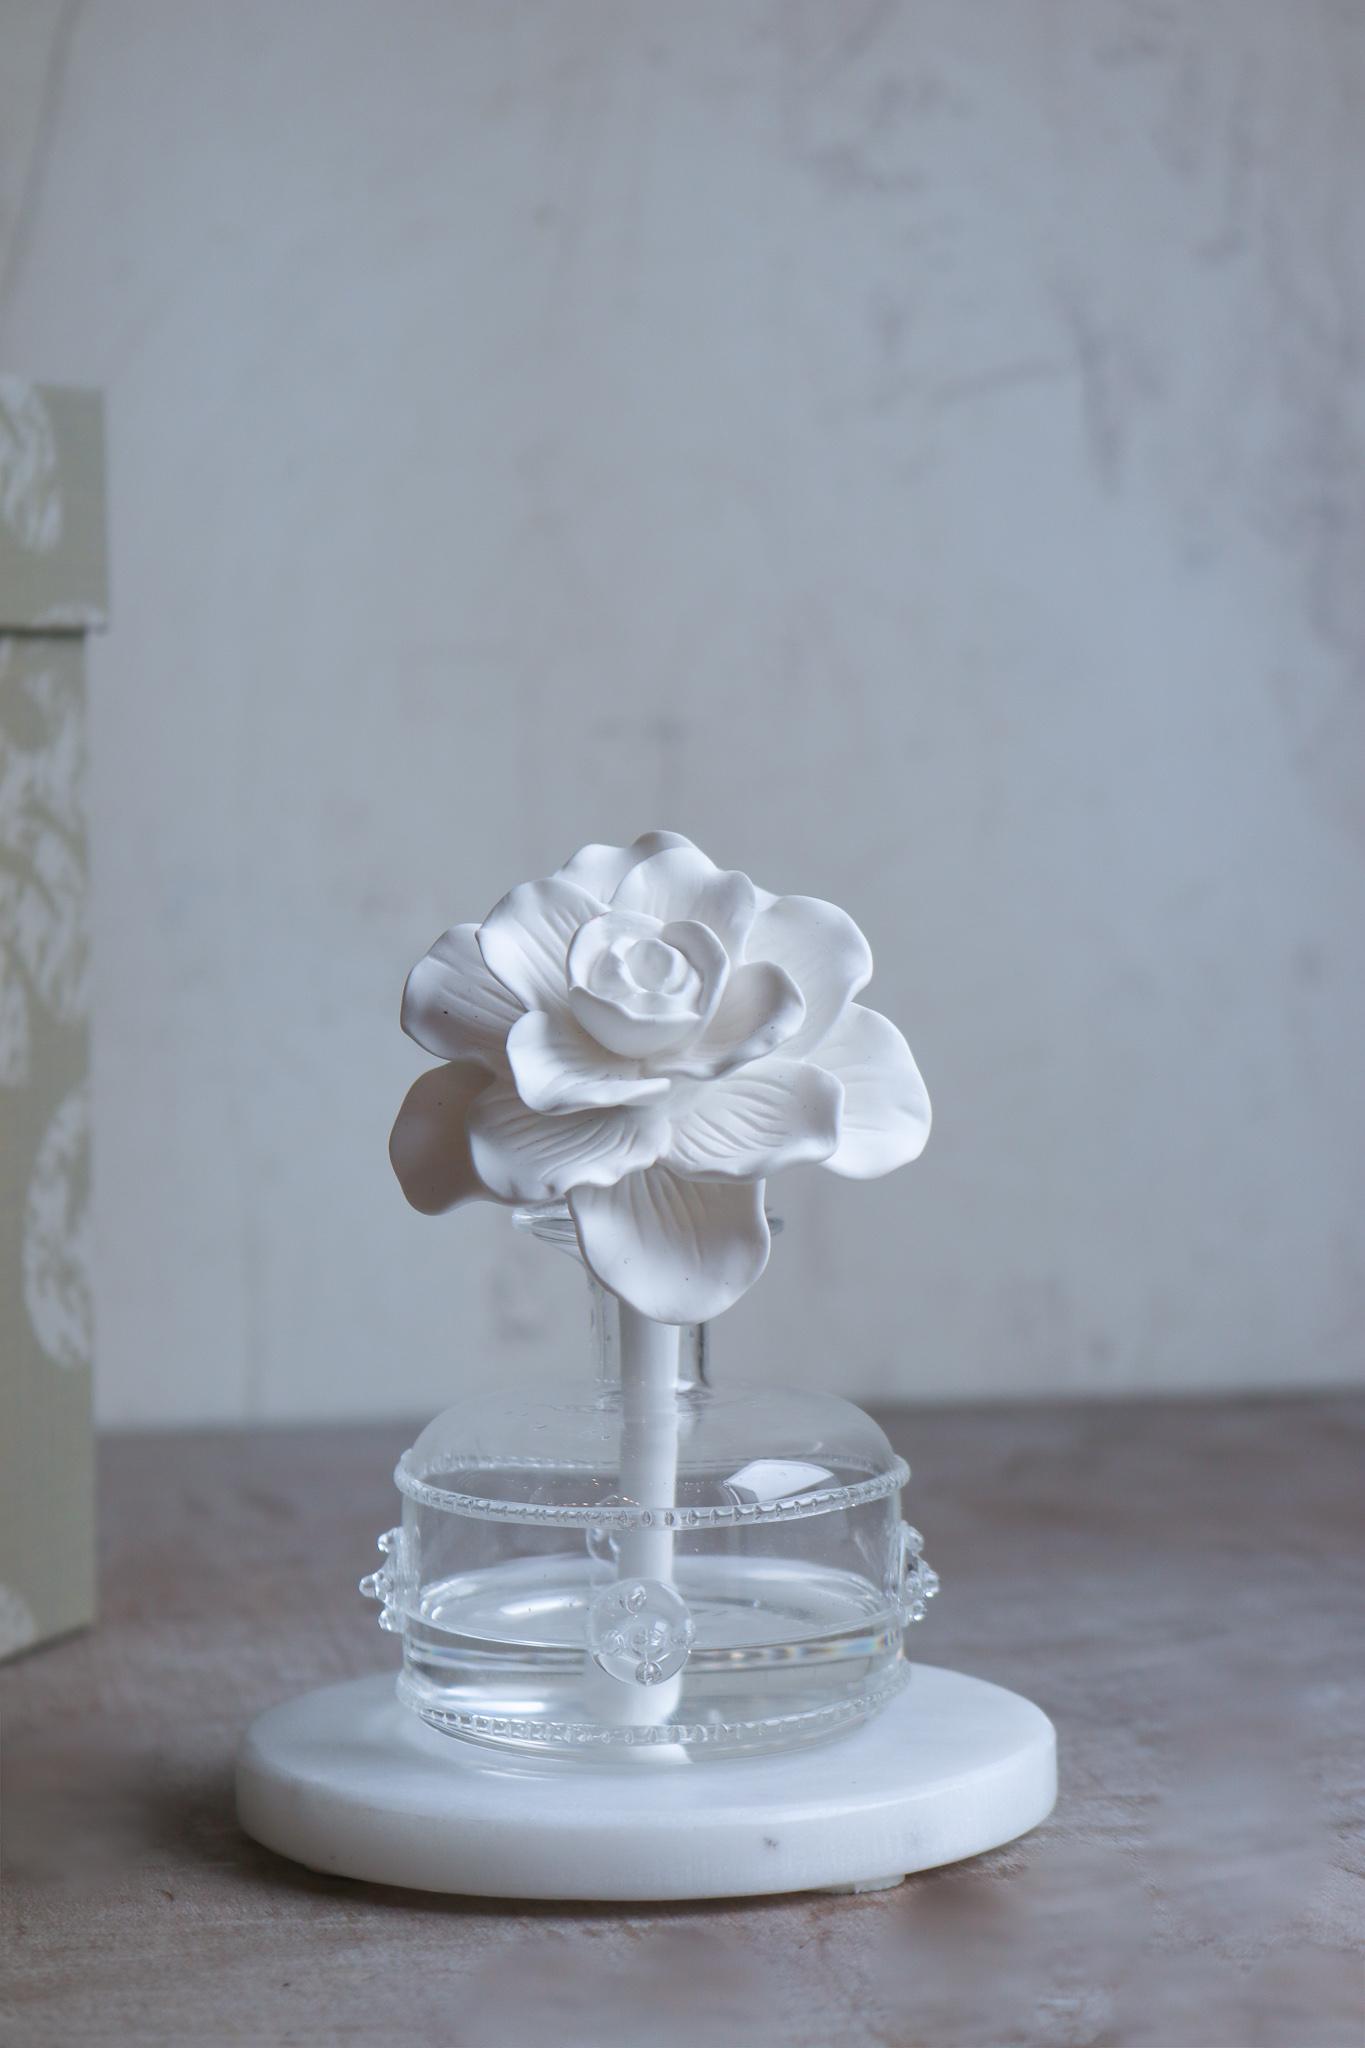 Porcelain Botanical Oil Diffuser Florist Andover Ma Floral Home